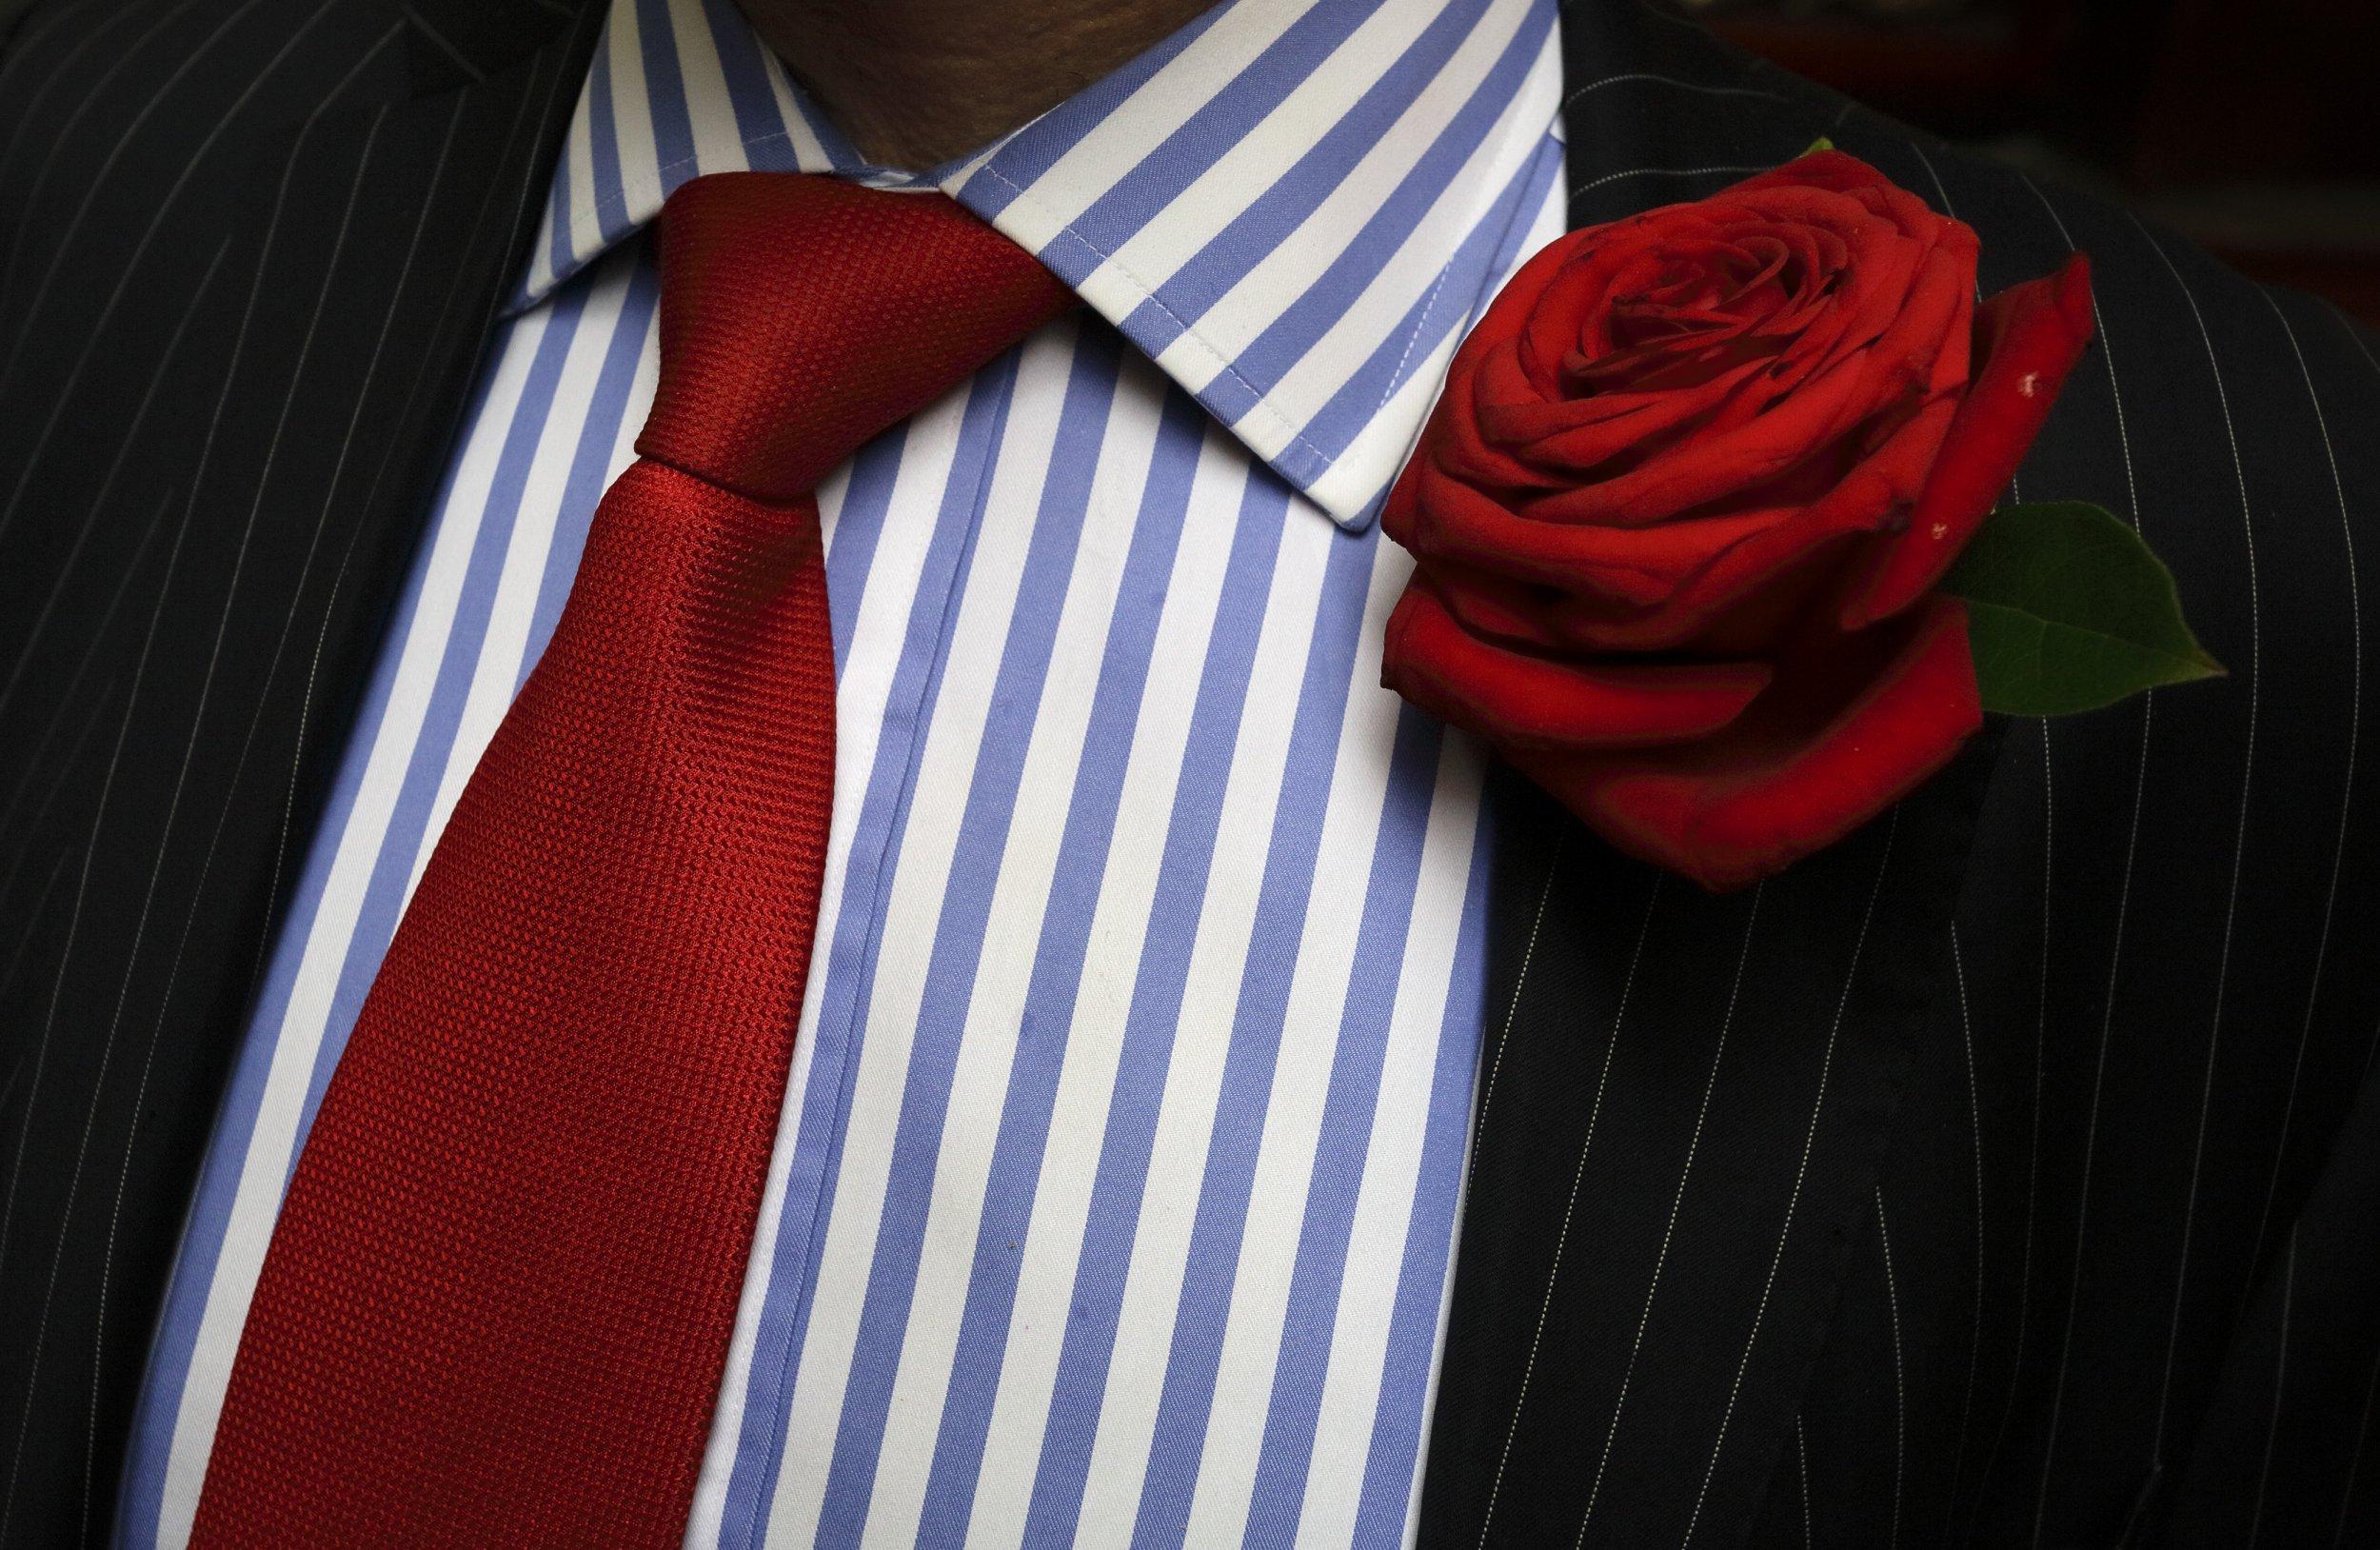 23/04/2012_Red Rose